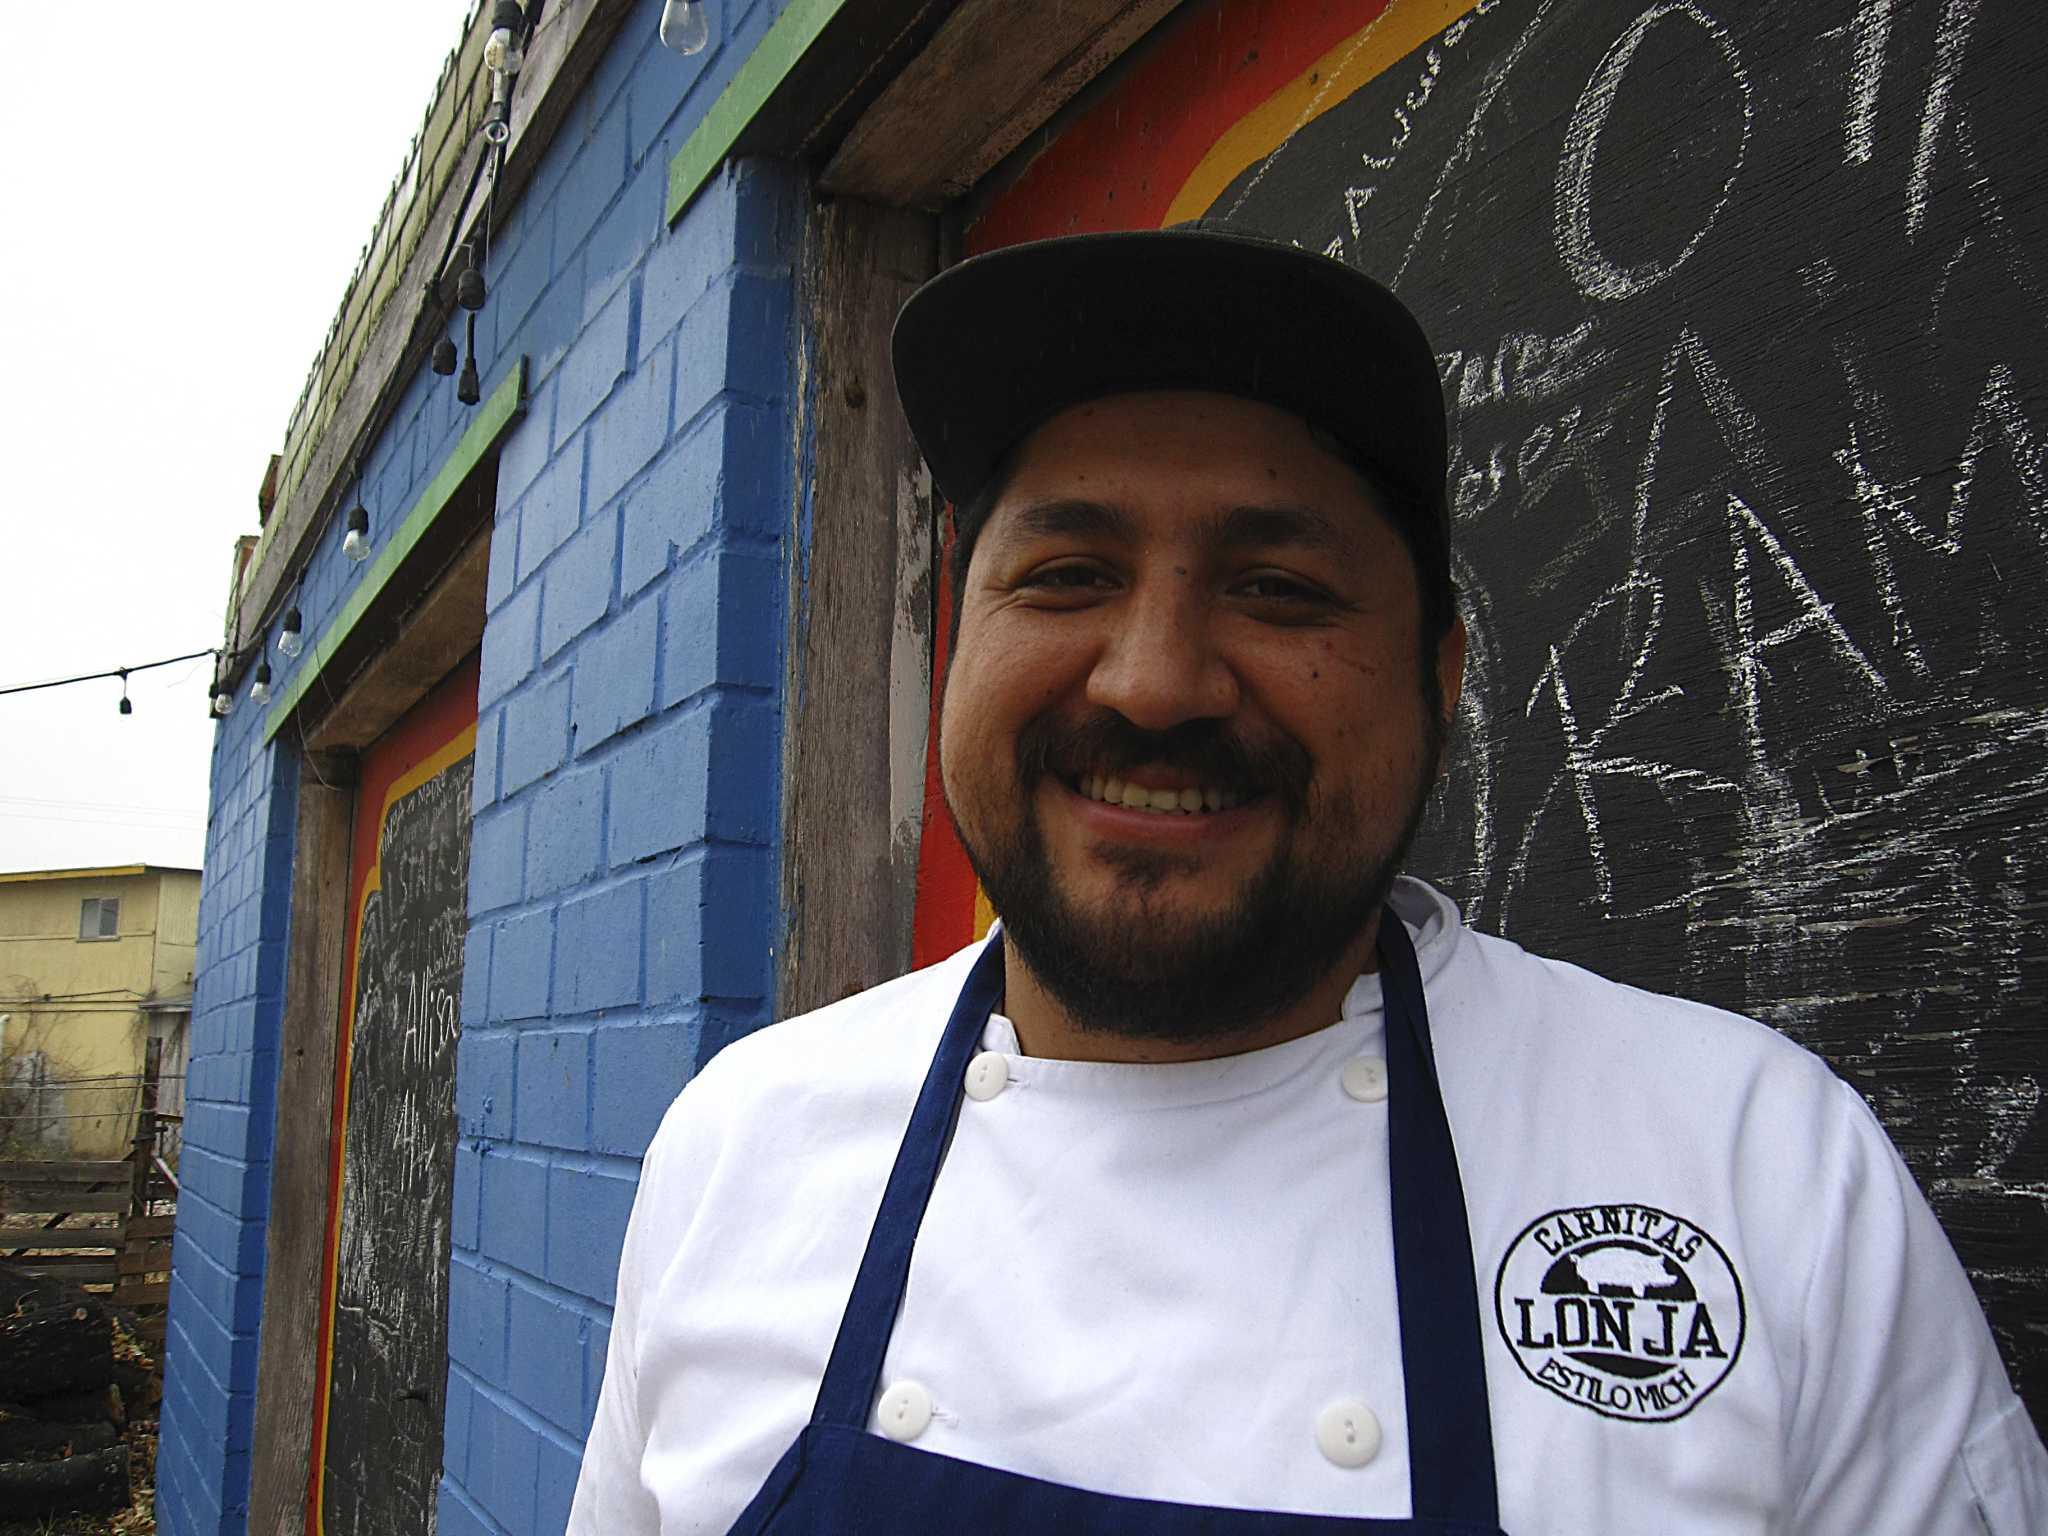 Three San Antonio chefs named James Beard Award semifinalists for Best Chef: Texas